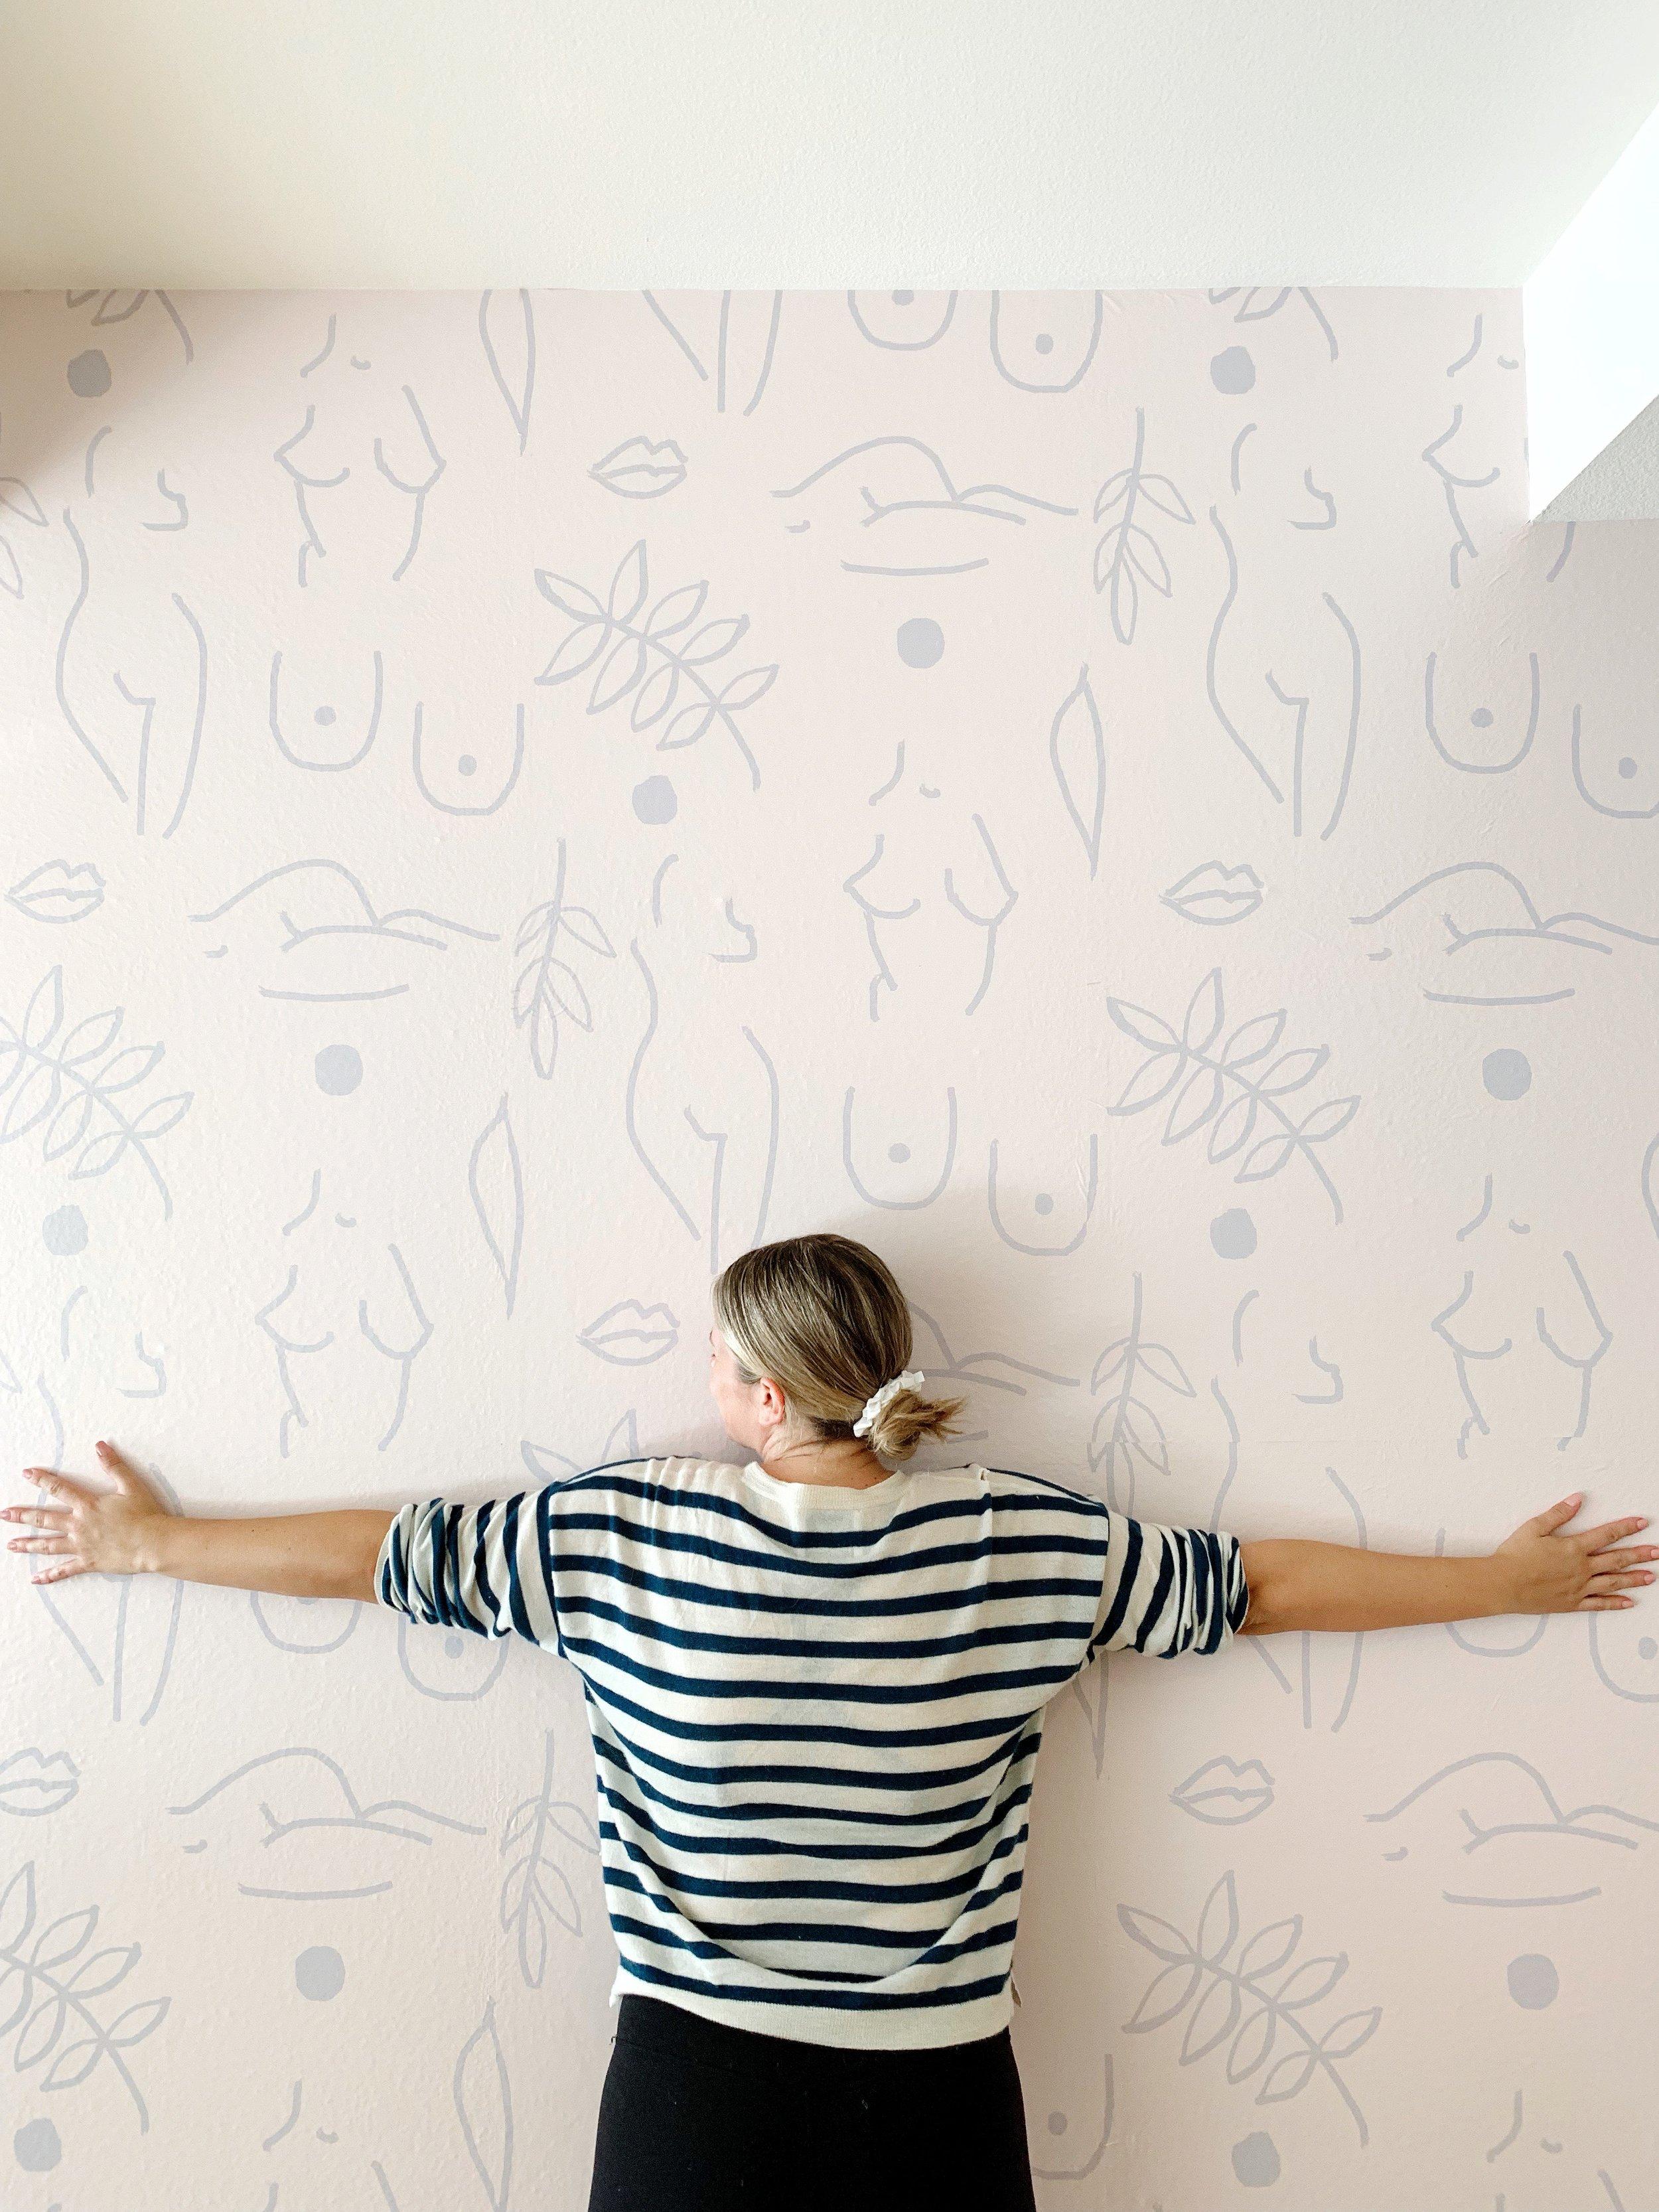 Neutral Nudes Removable Wallpaper Peel Stick Fabric Wallcovering Samantha Santana